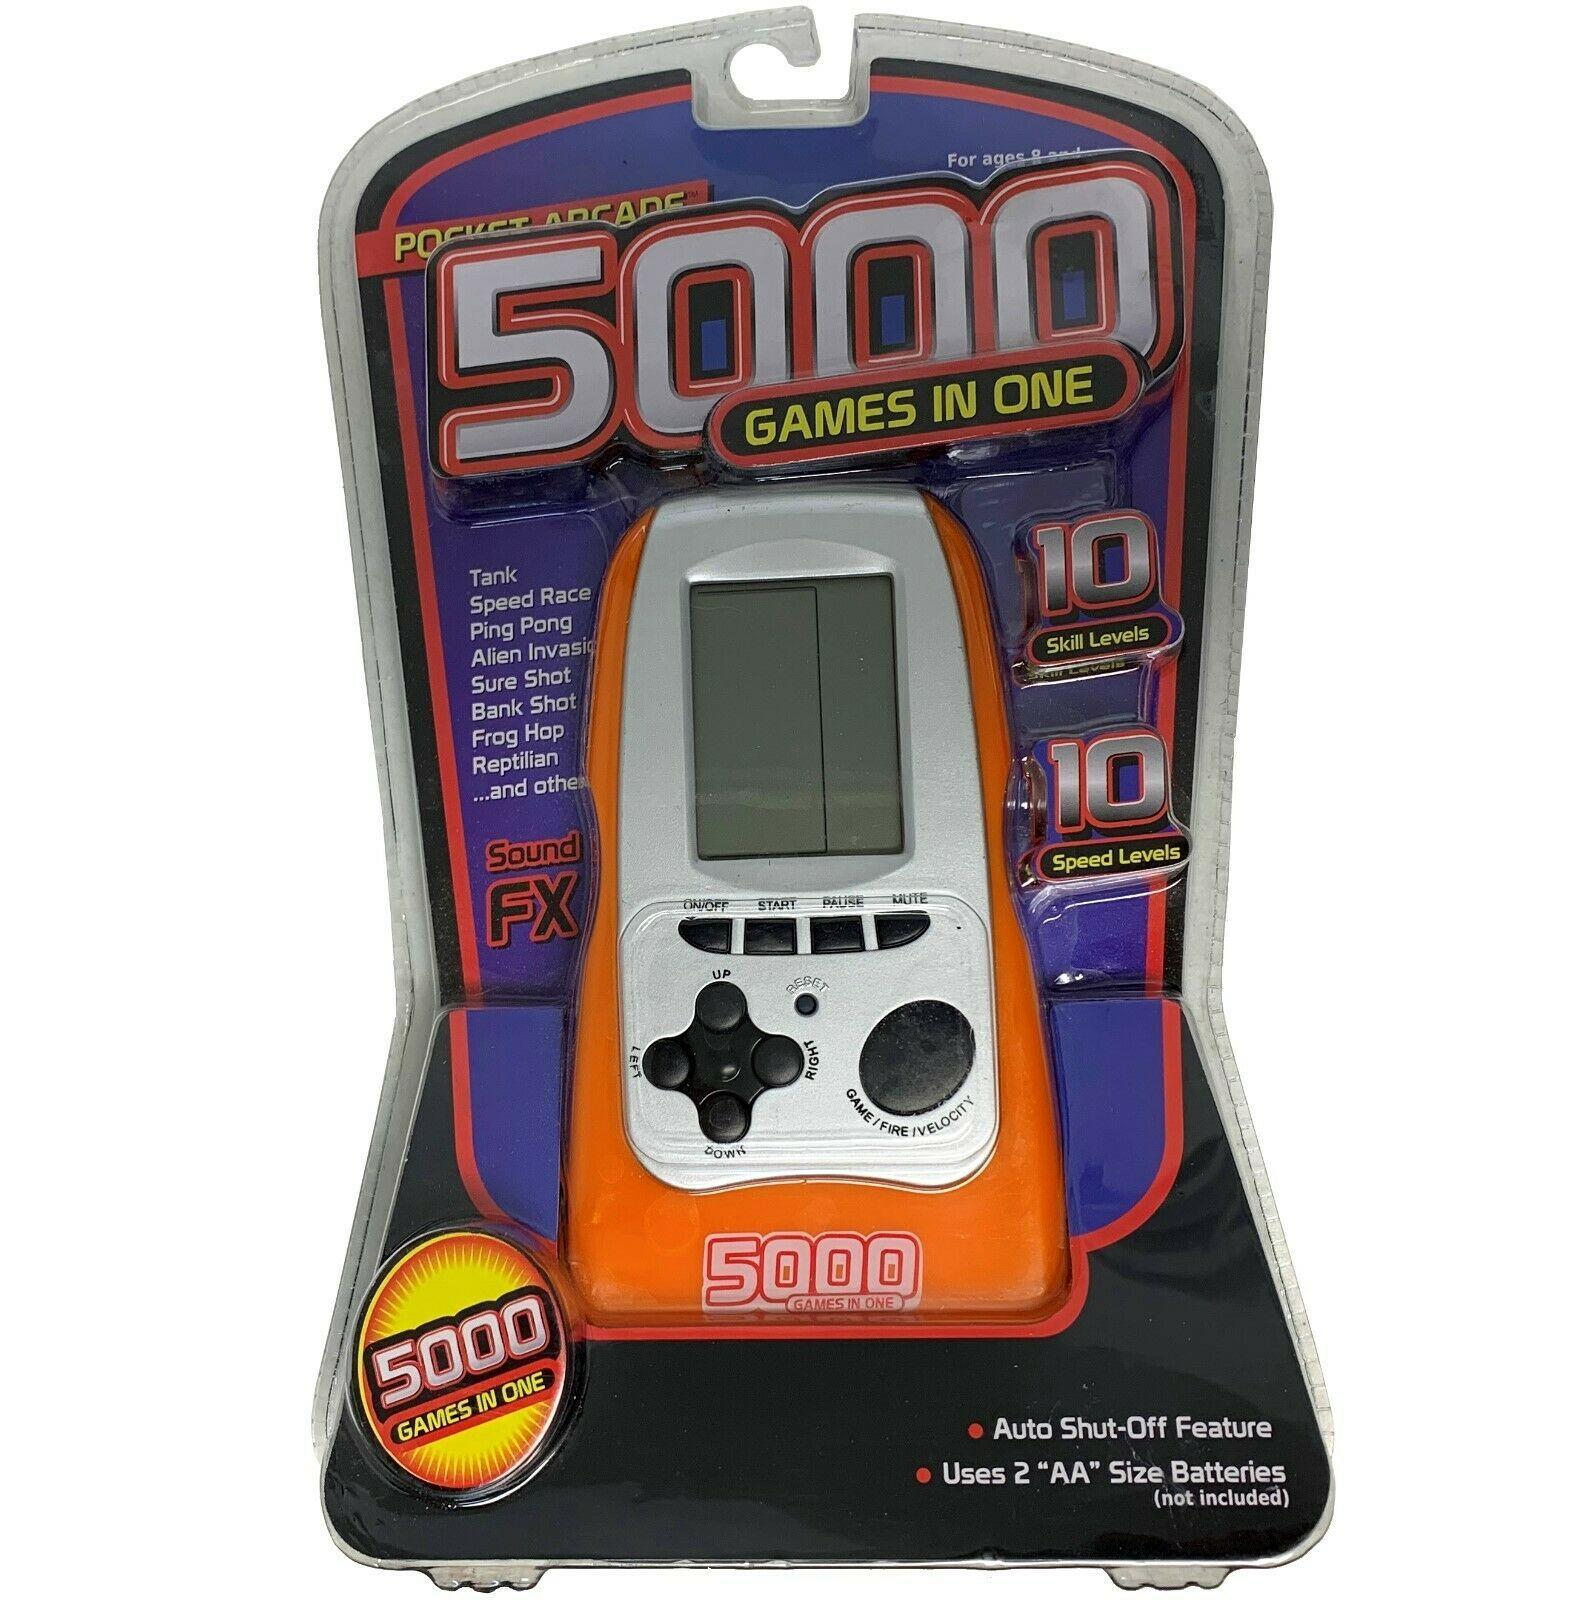 Westminster - 5000 Games-in-One Pocket Arcade - Handheld Electronic Game ORANGE - £8.69 GBP